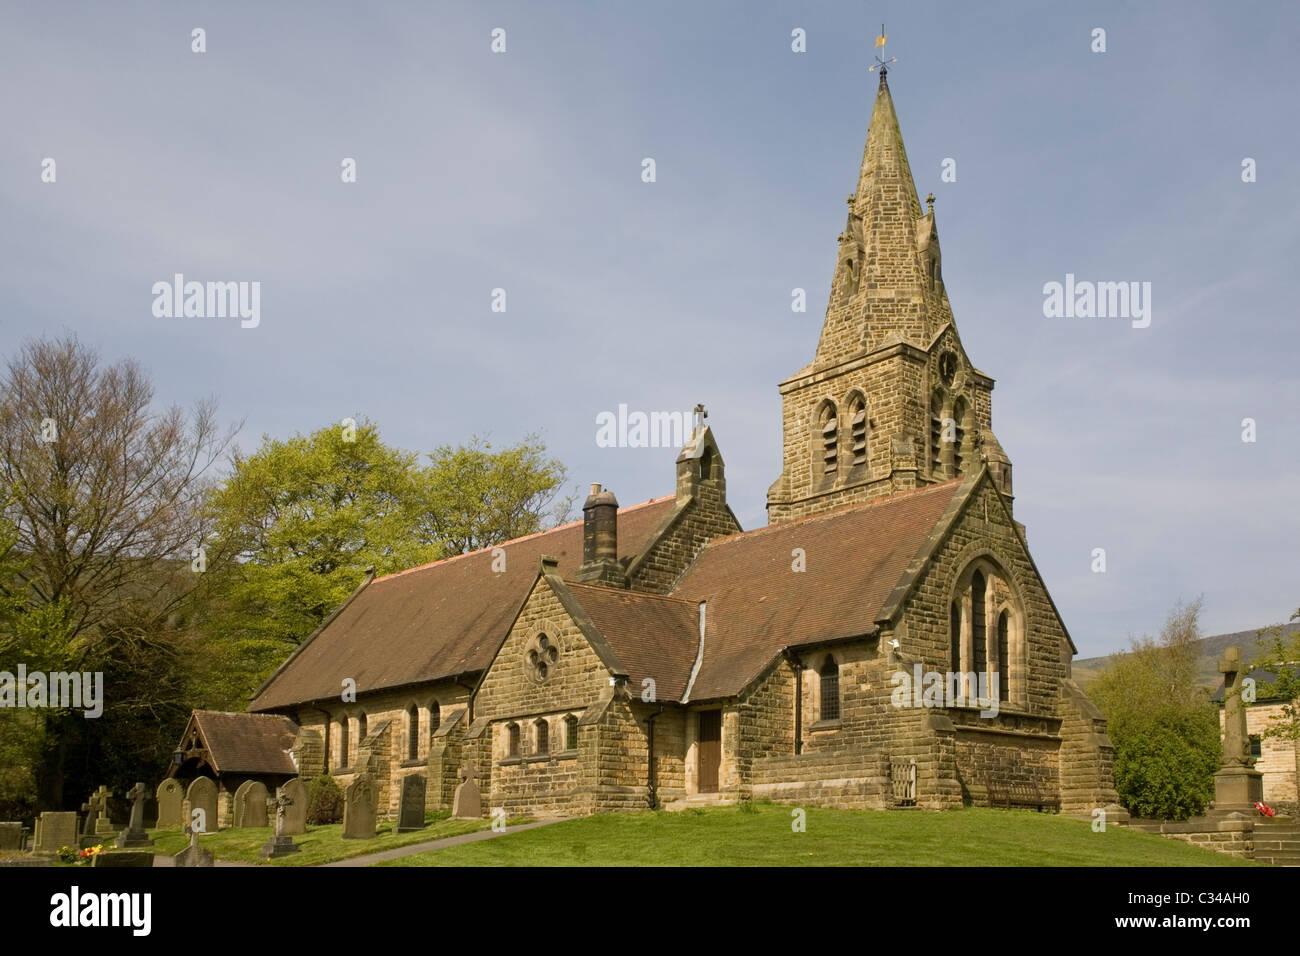 England Derbyshire Peak district Edale church - Stock Image